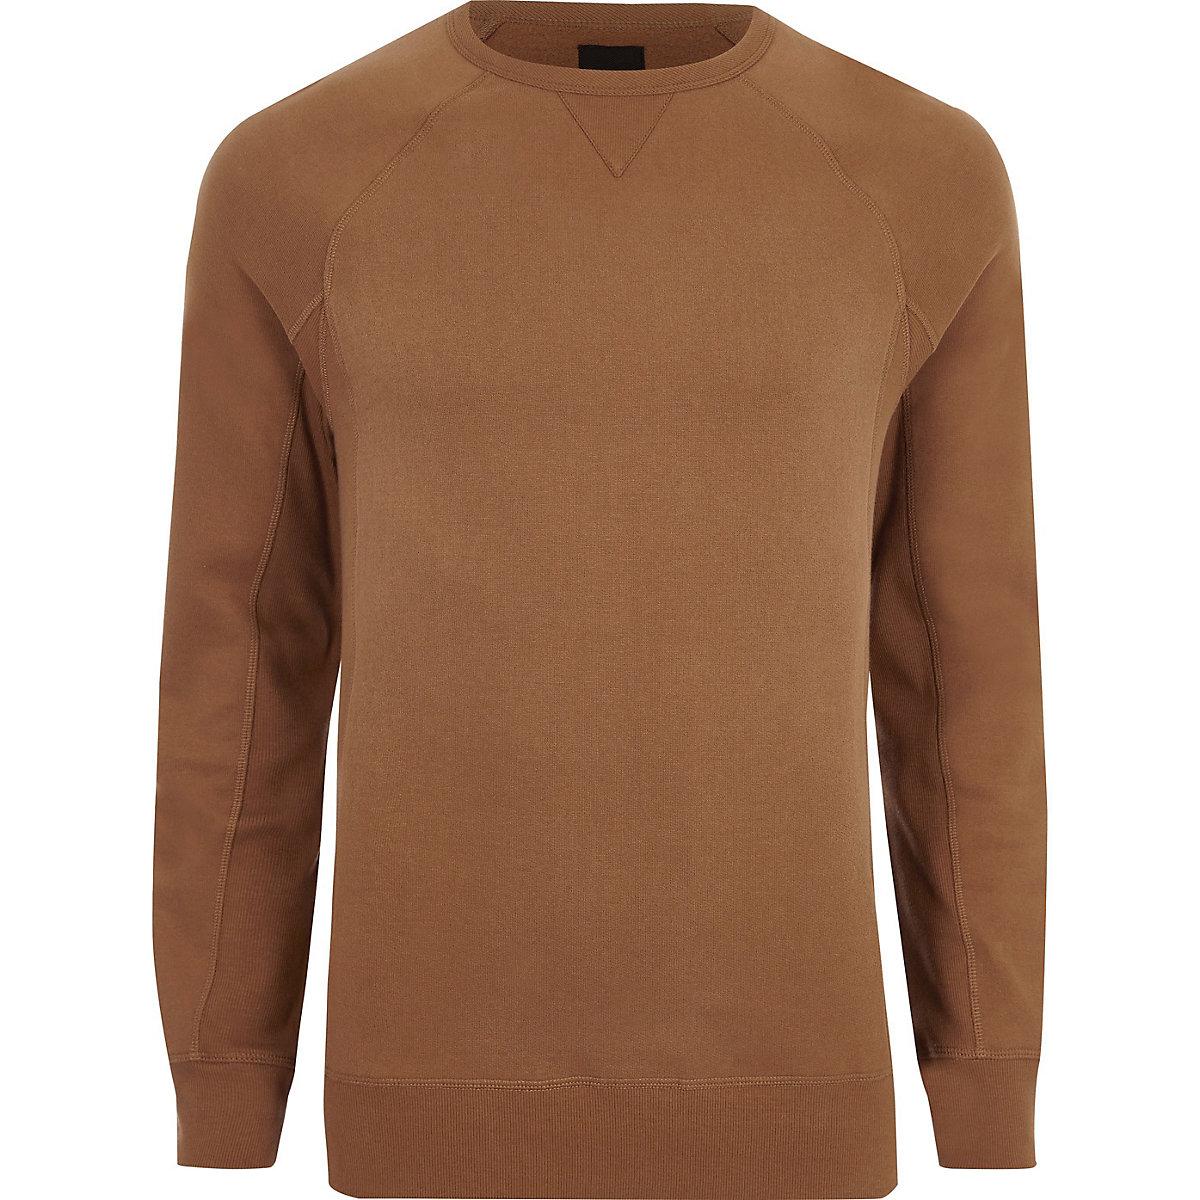 Tan muscle fit long sleeve sweatshirt